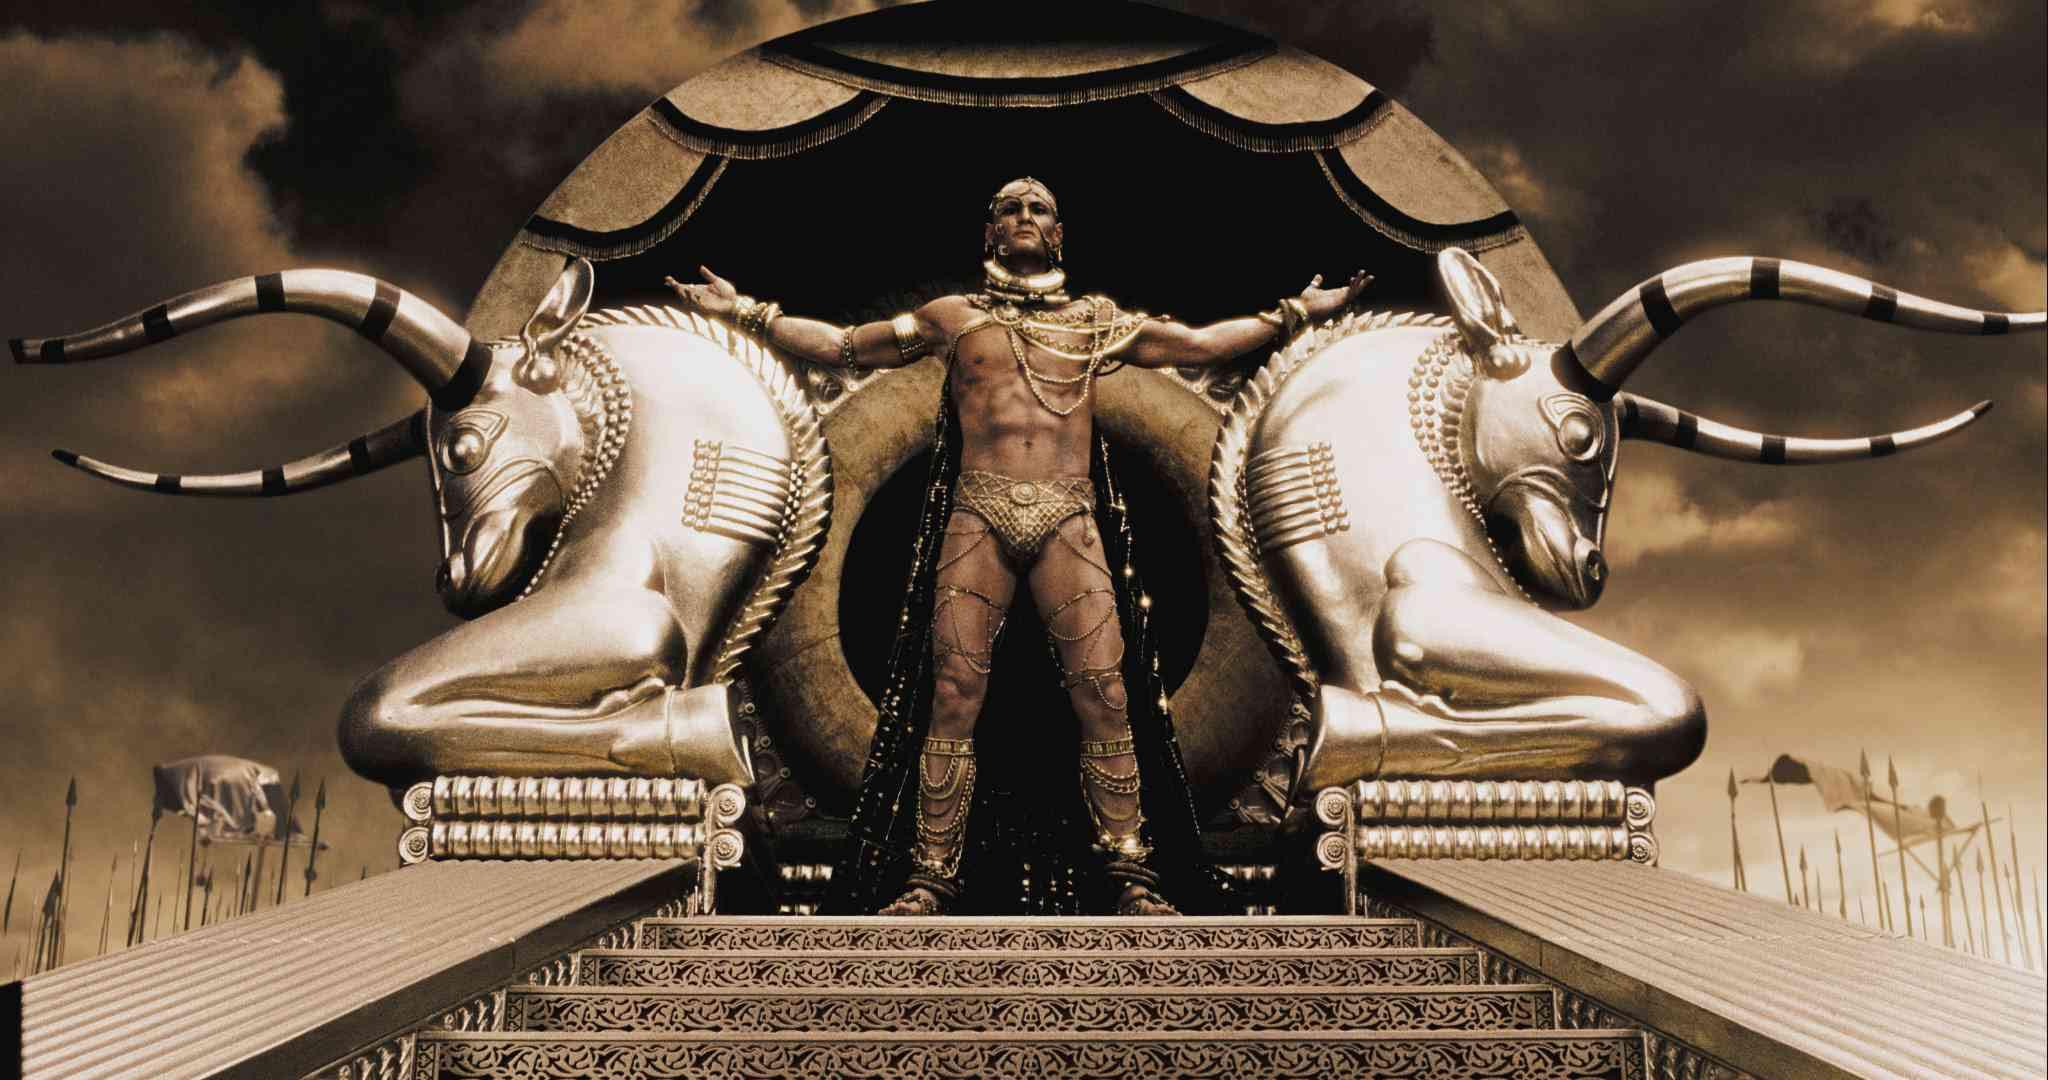 Rodrigo Santoro Plans to Reprise Xerxes In New \u2018300